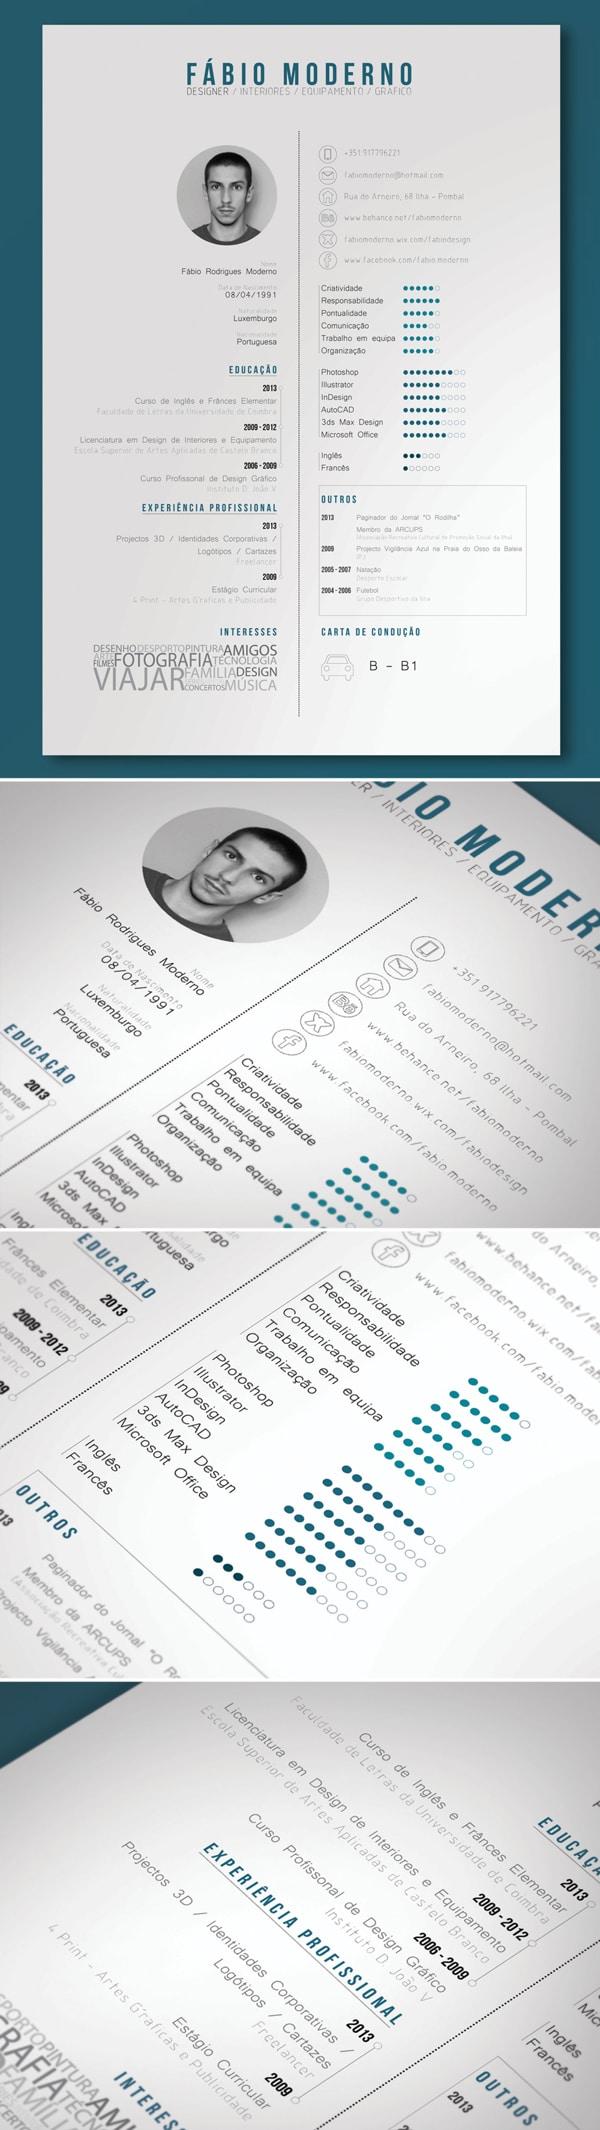 55 amazing graphic design resume templates to win jobs